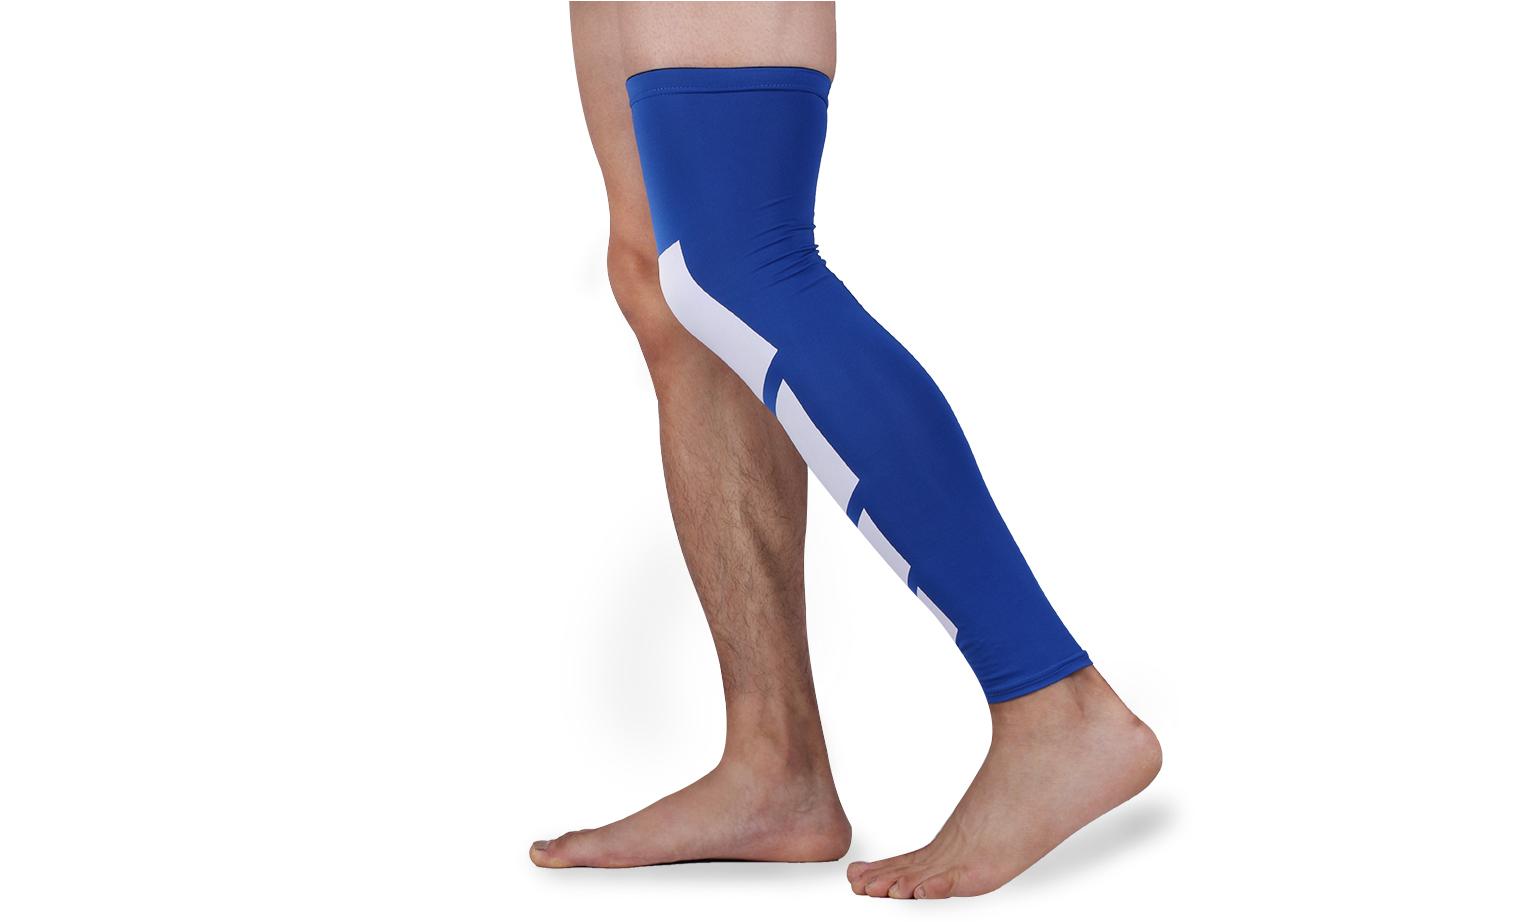 Unisex Full-Length Knee & Calf Medical Grade Compression ...